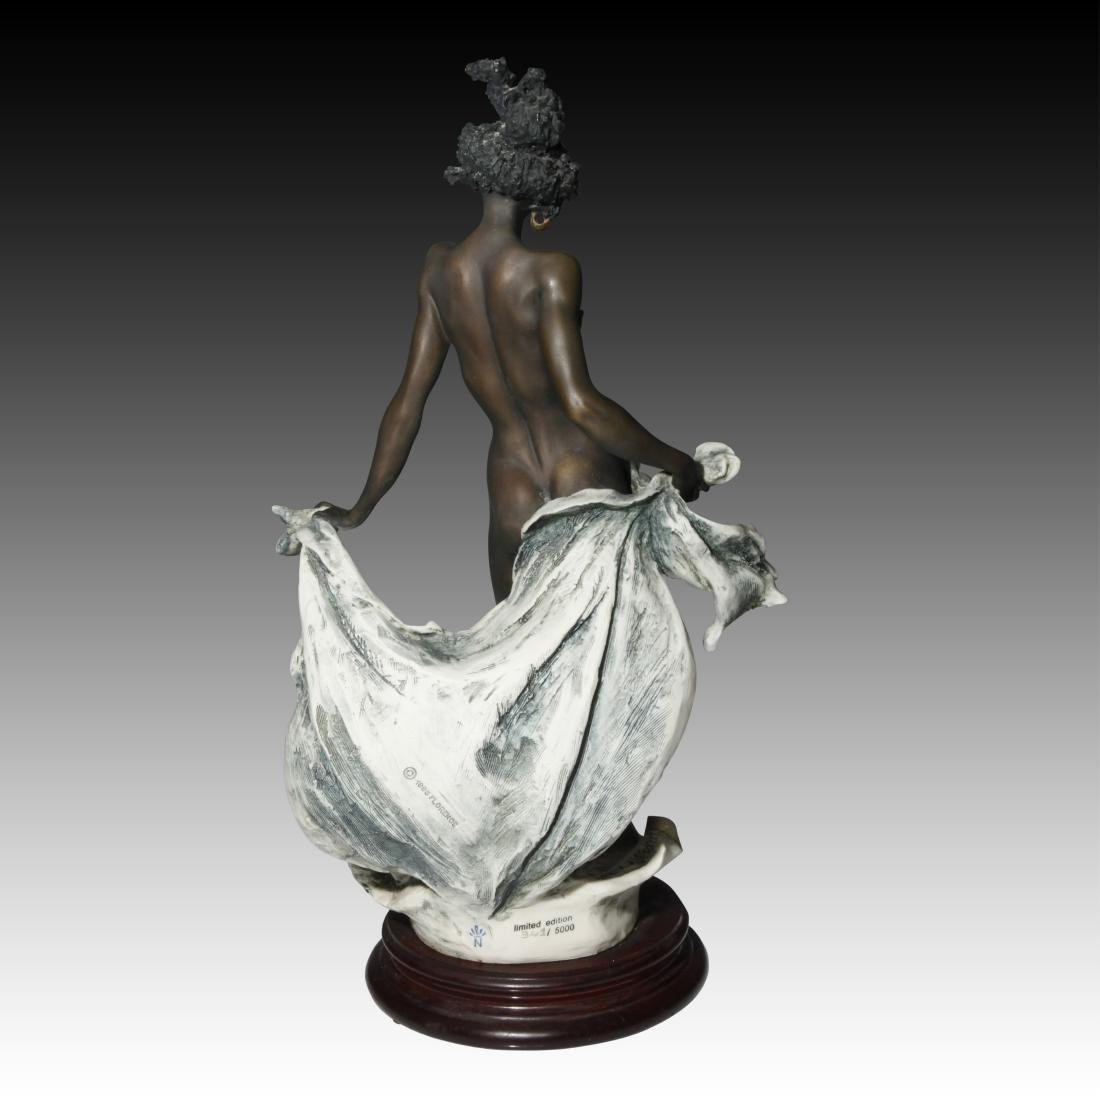 Giuseppe Armani Venere Nera Ebony Woman in Shell - 2